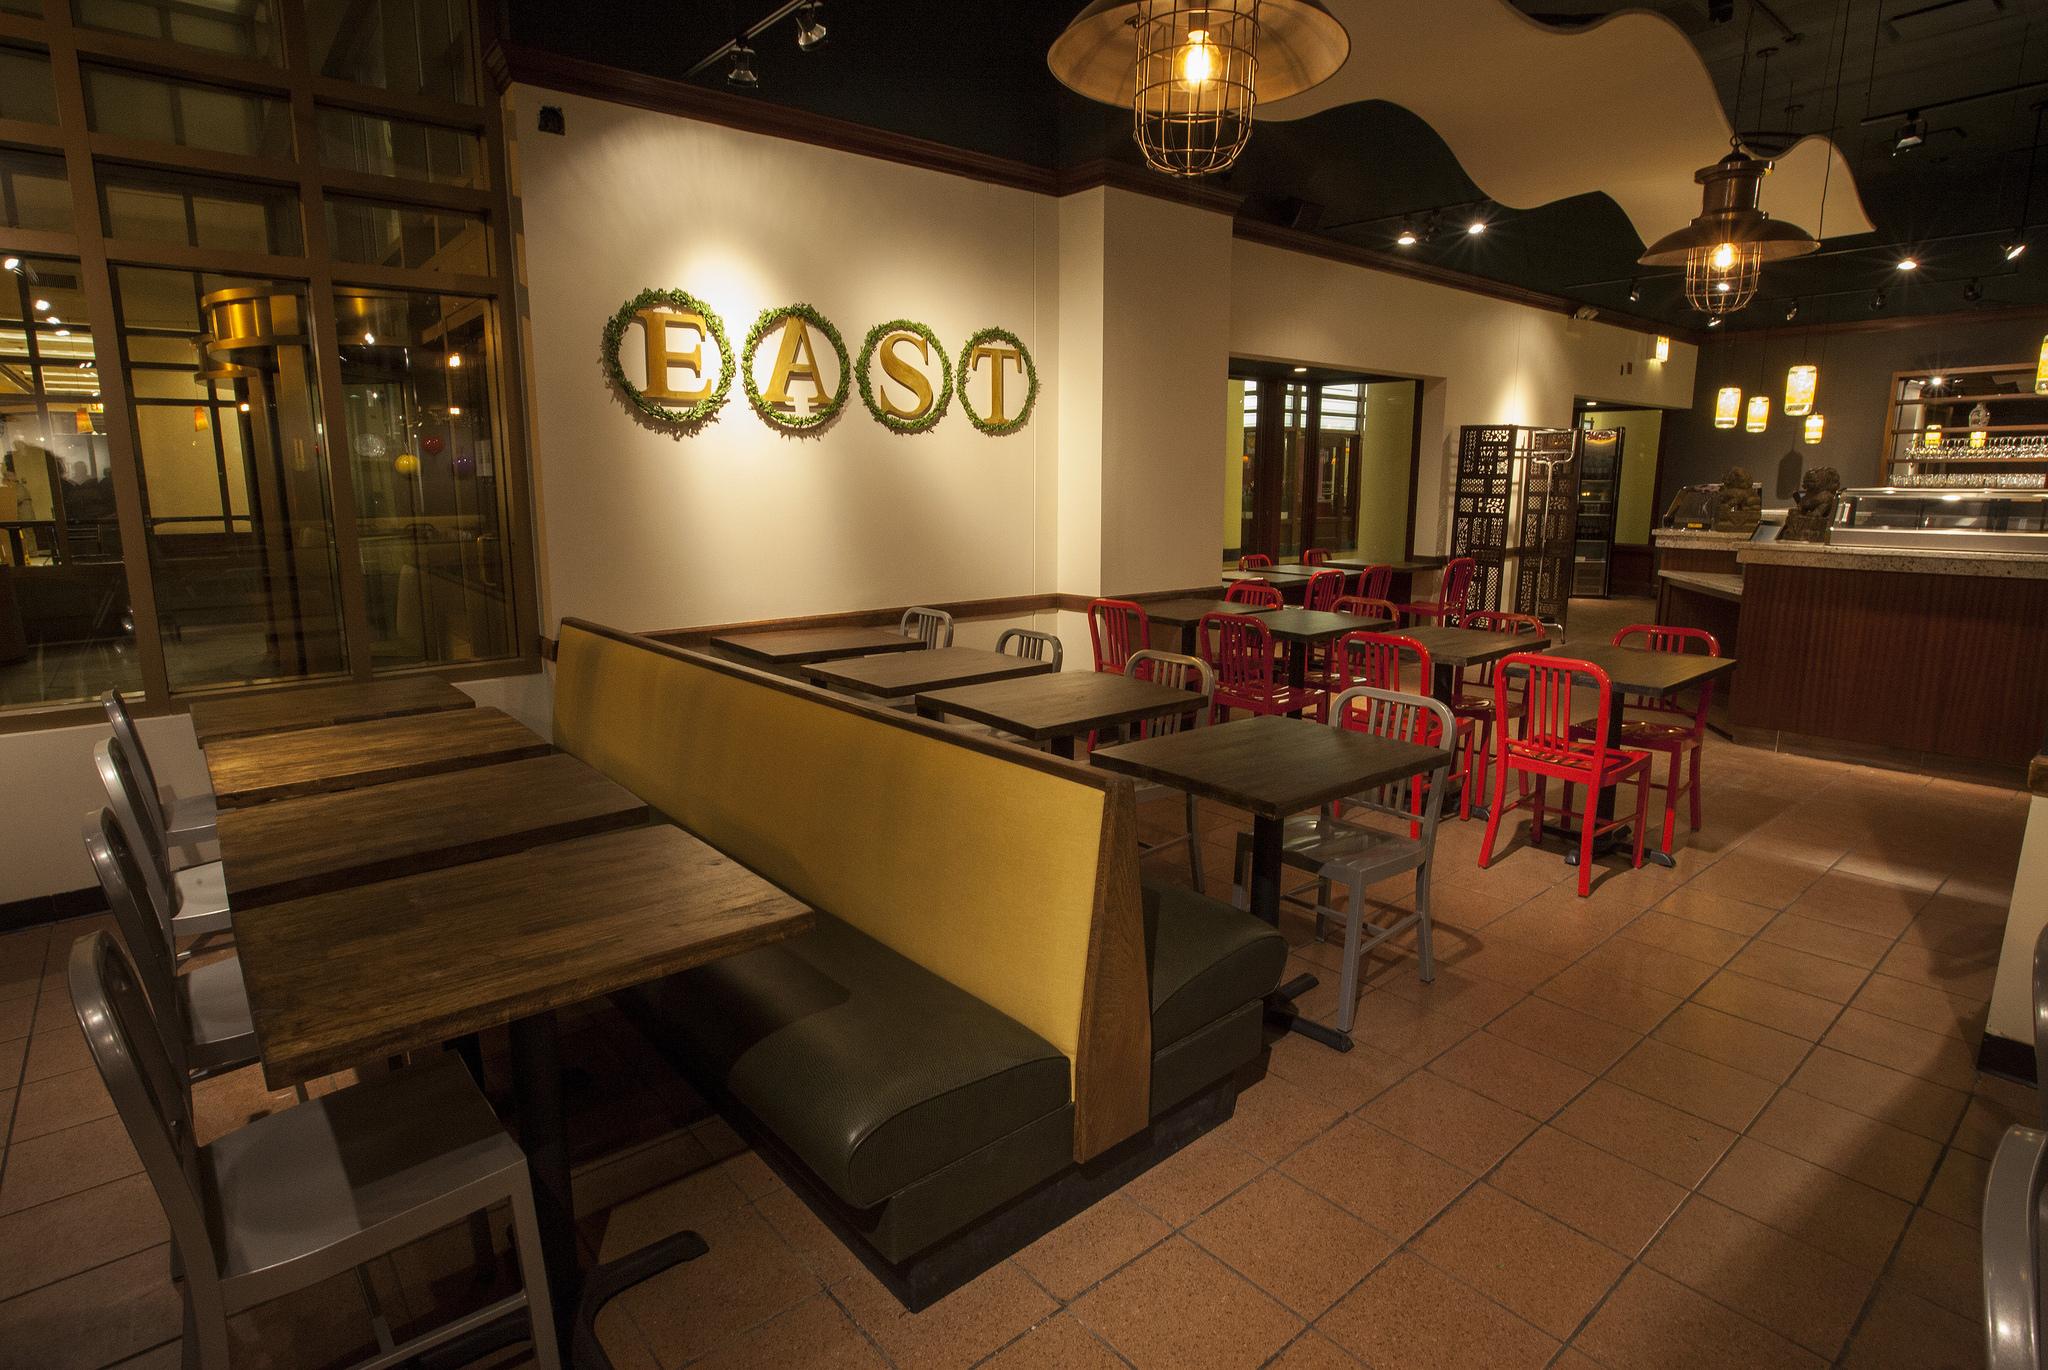 Hot Woks Cool Sushi's East Gives DePaul Center A Modern